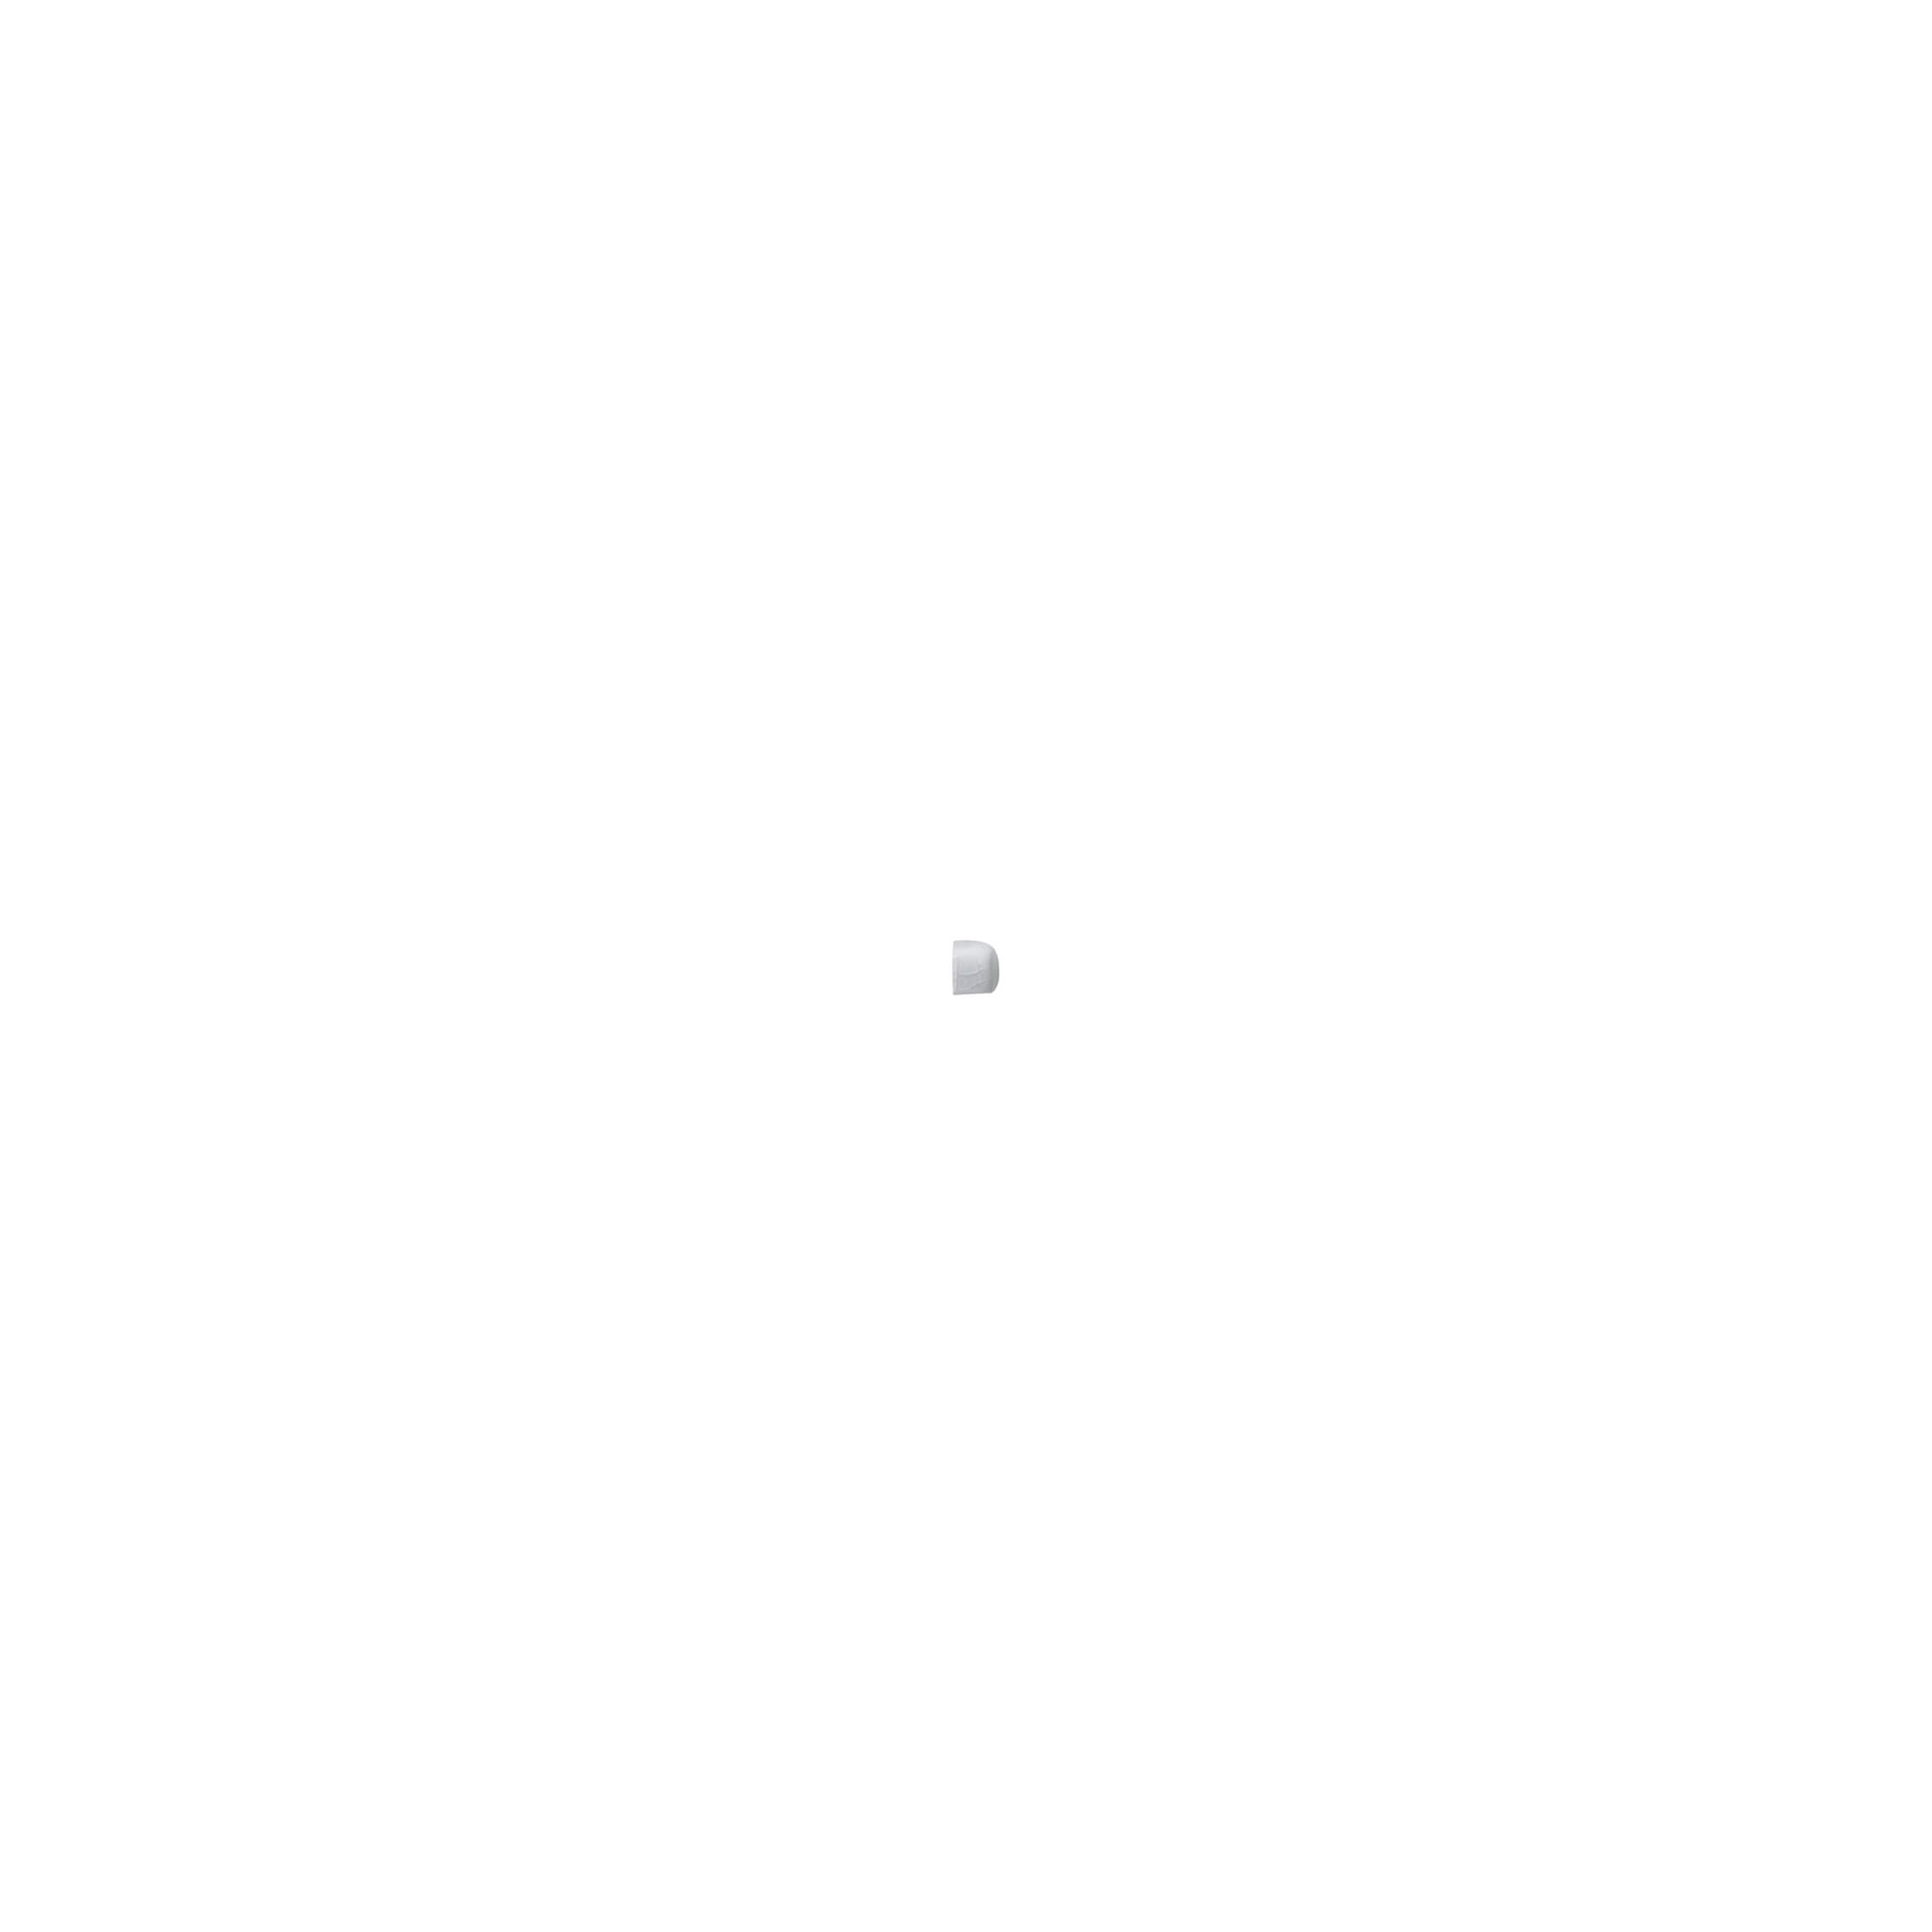 ADMO5451 - ANGULO BULLNOSE TRIM C/C